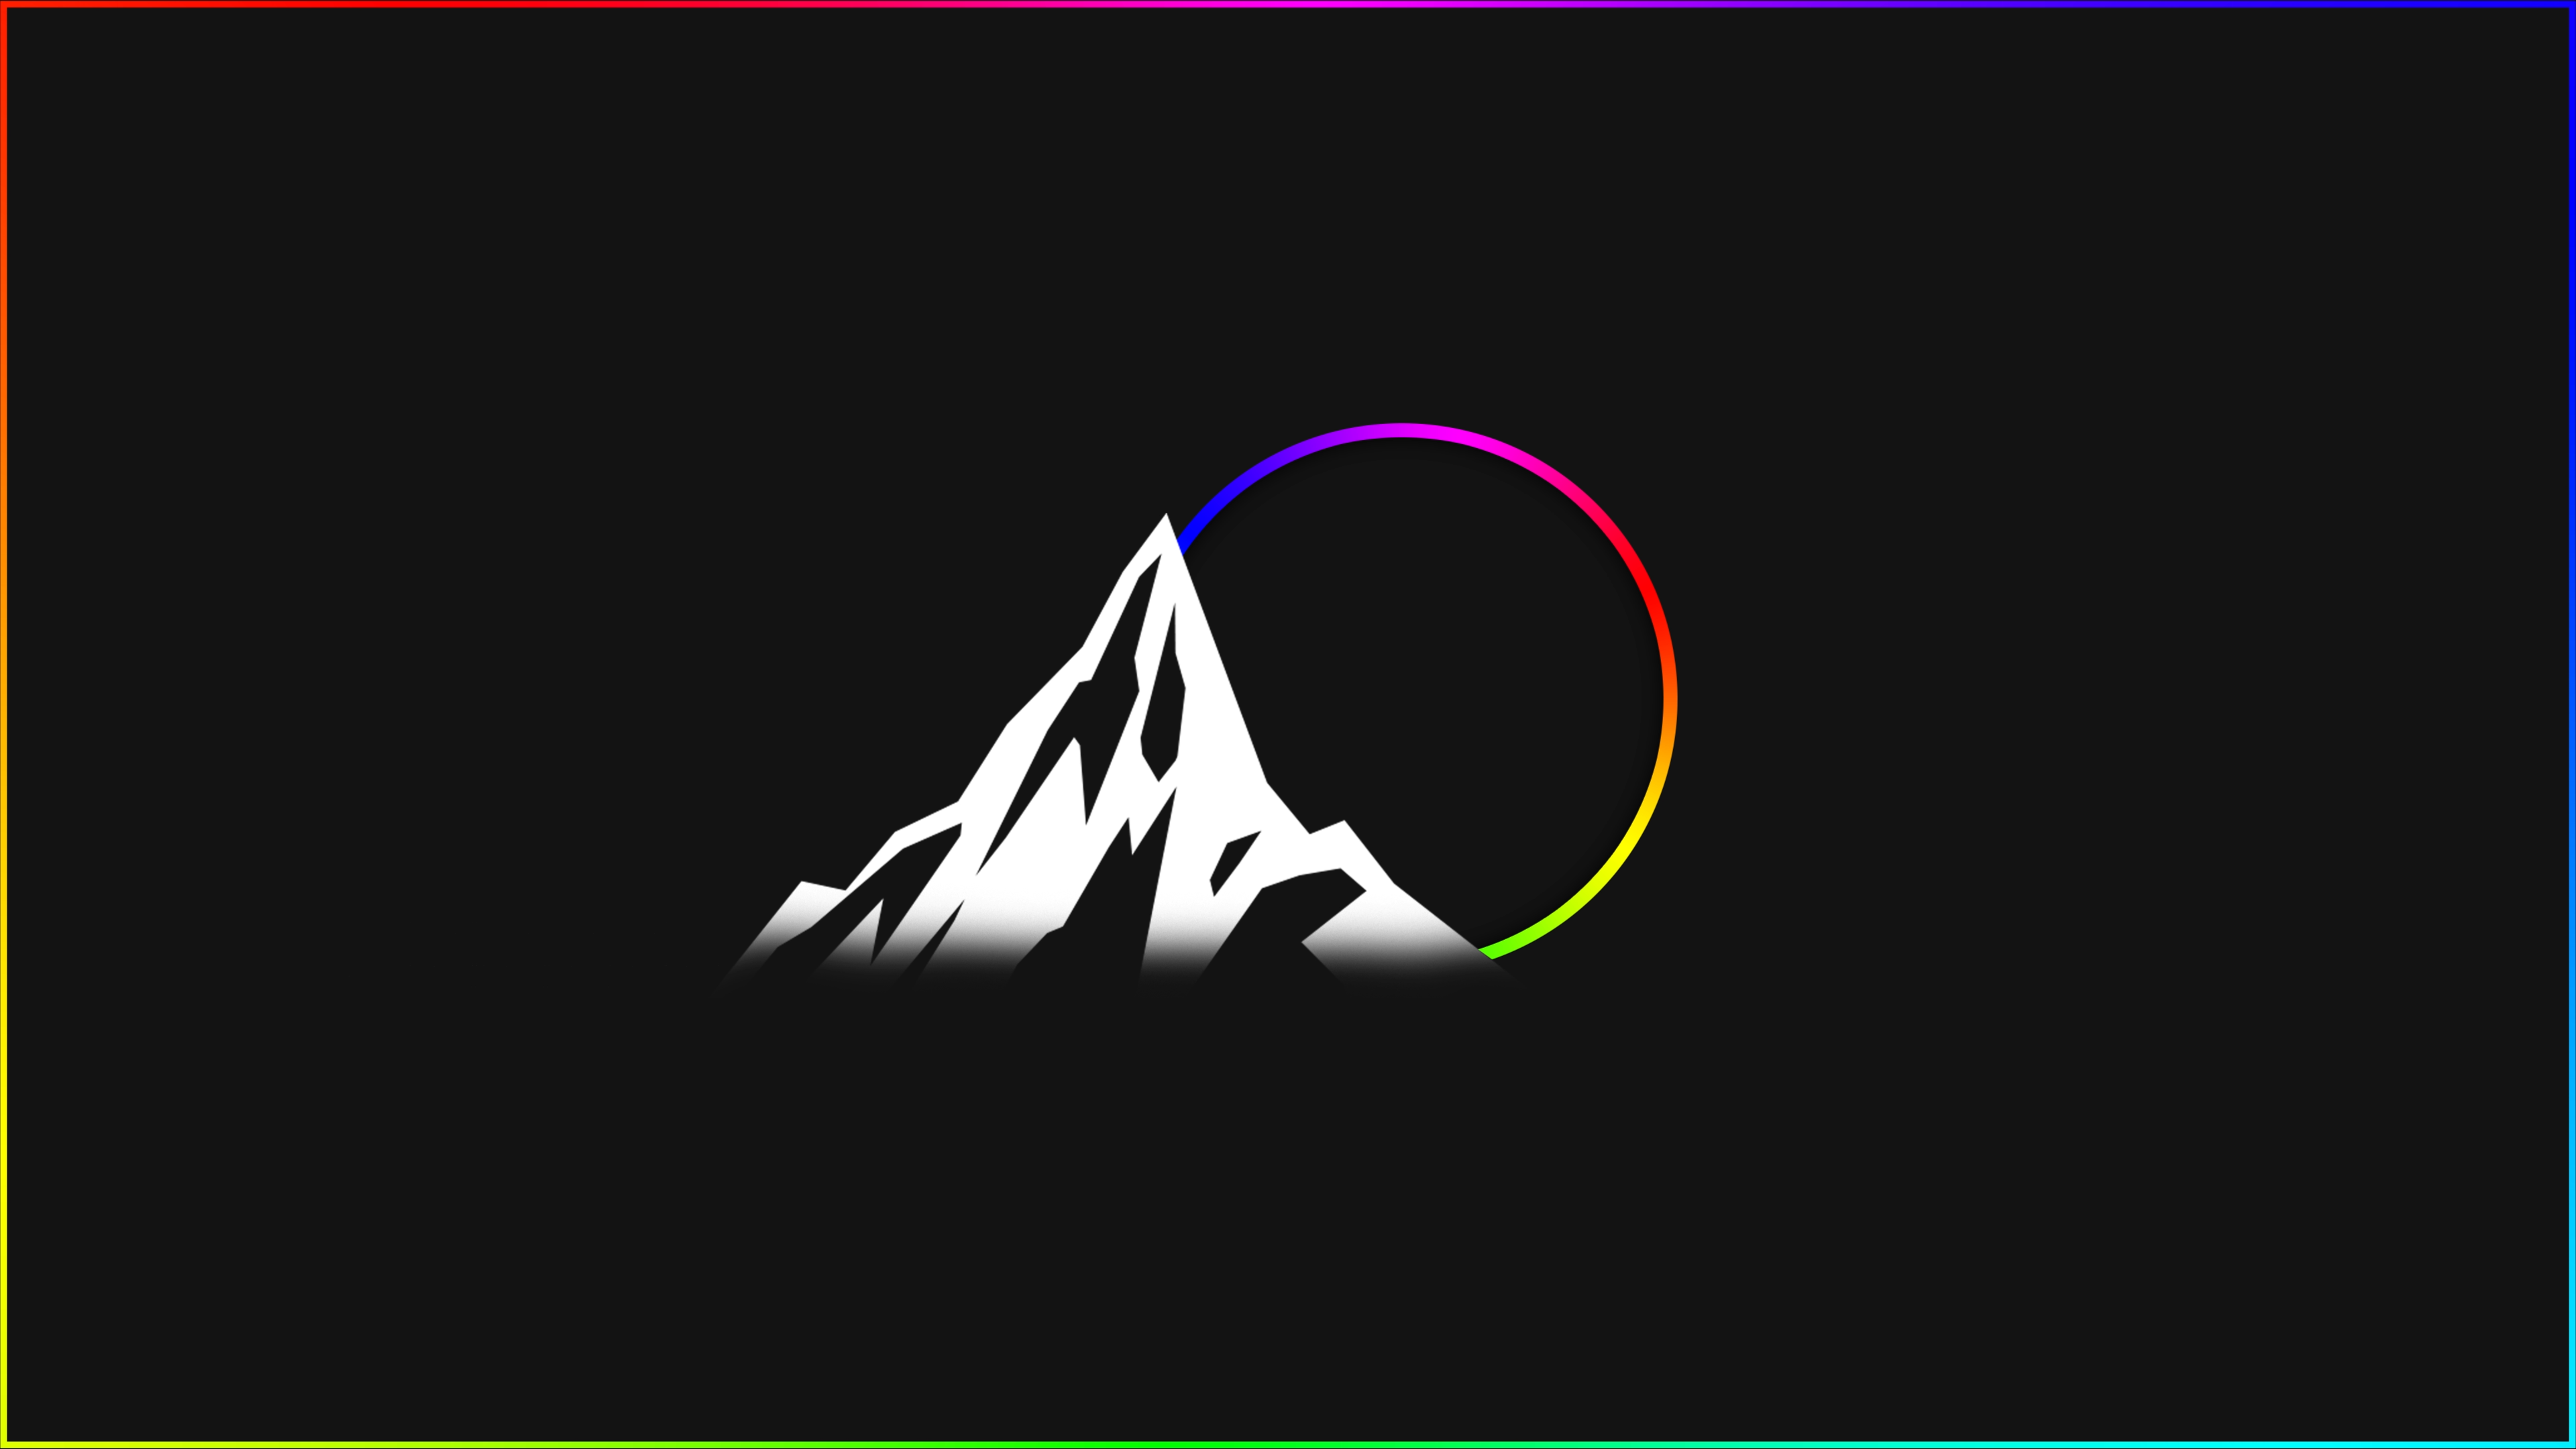 RGB Edge Lit Wallpaper MinimalWallpaper